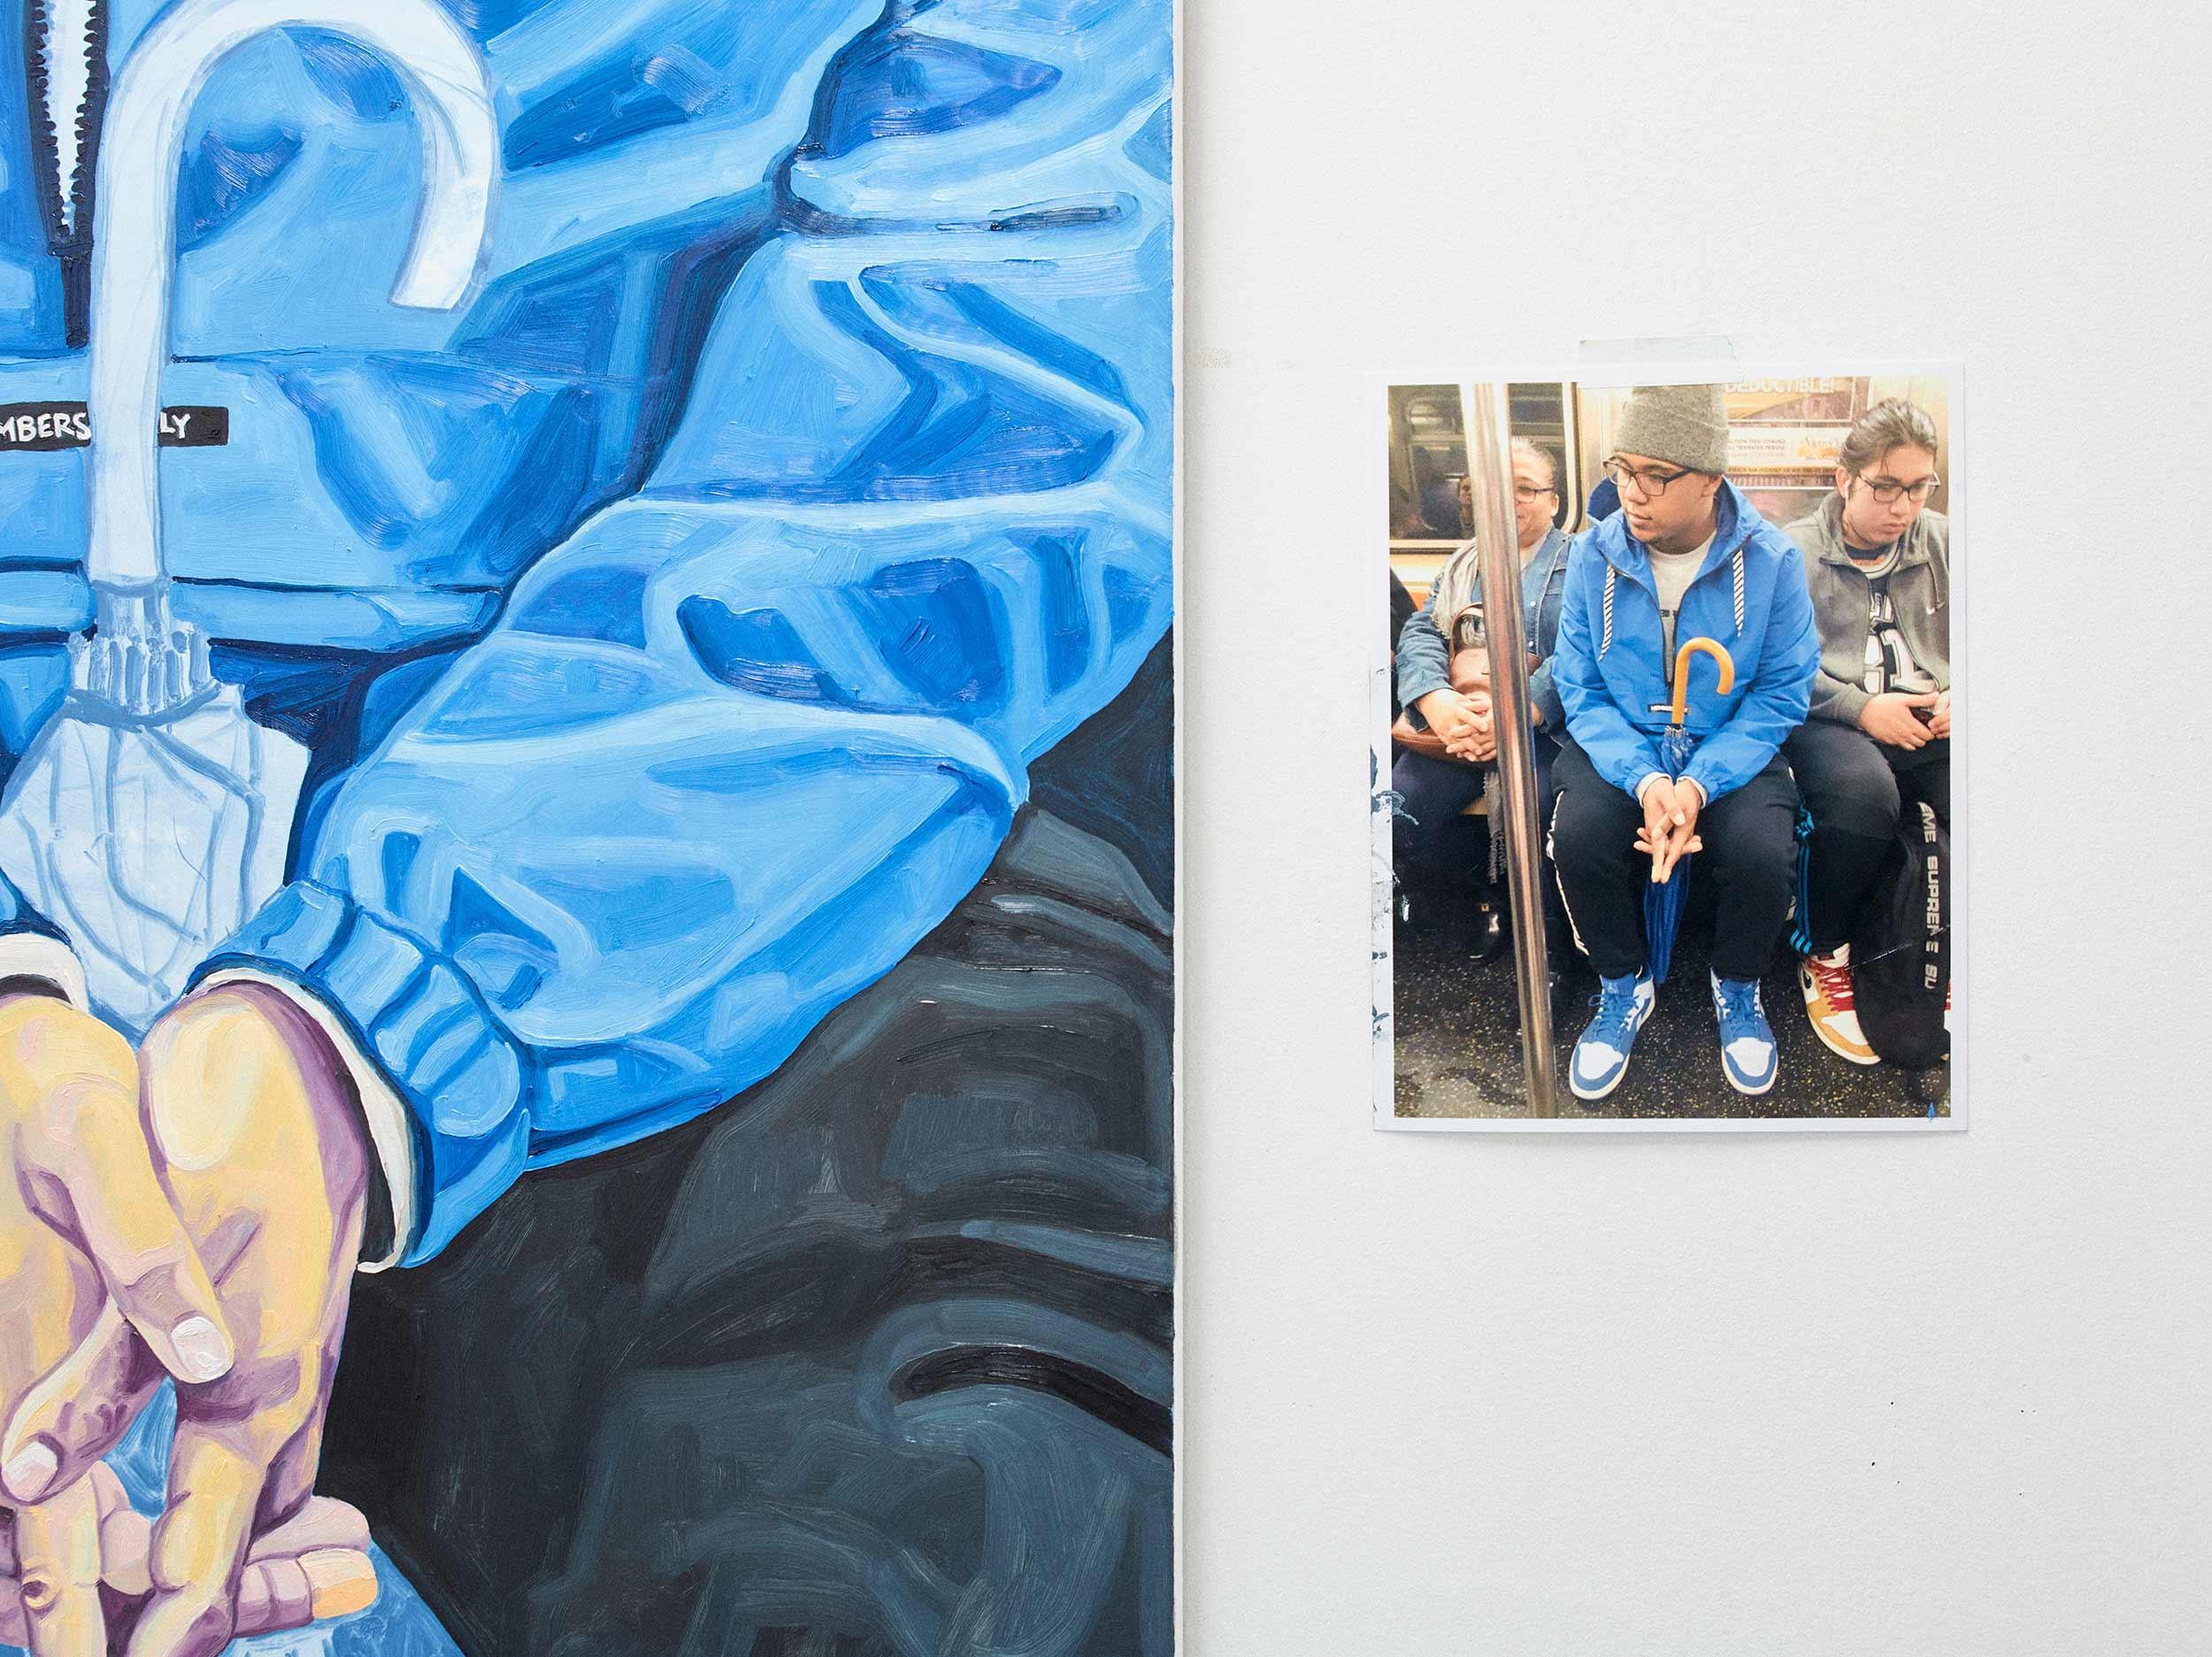 Celebrating our essential humanity in the paintings of Jordan Casteel